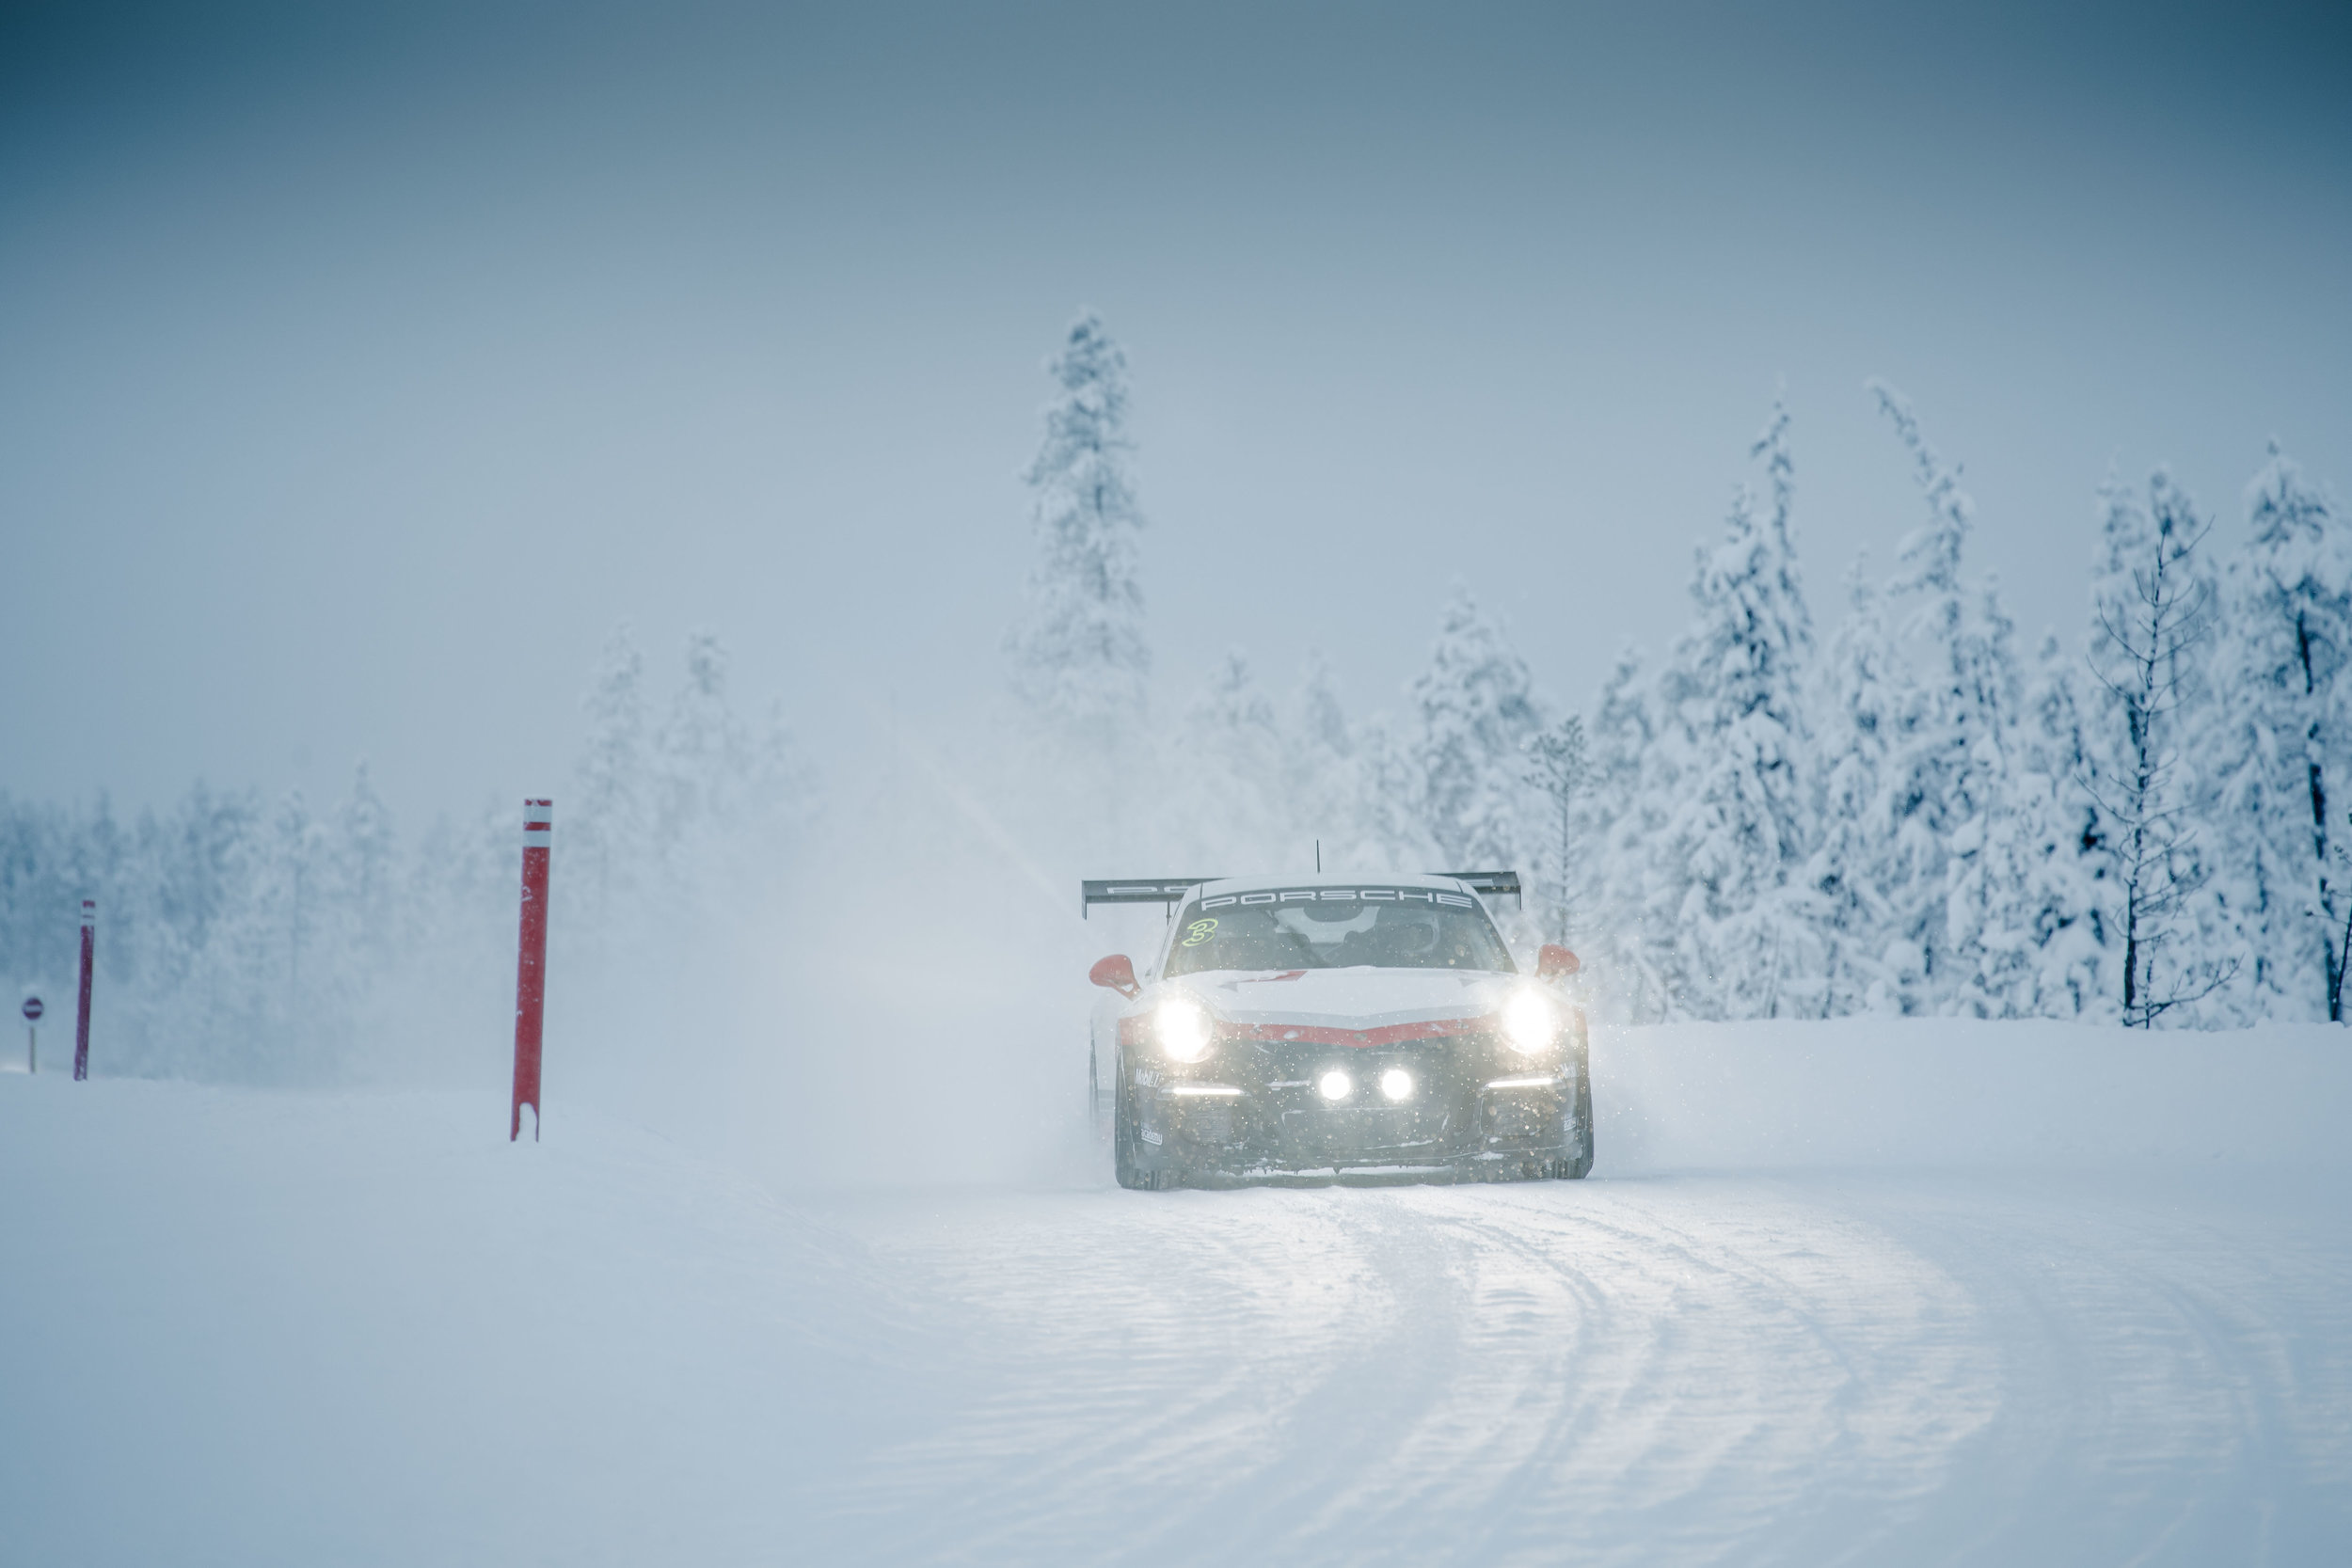 Porsche Ice Experience on Ice_30_01_2019_0483_175684.jpg